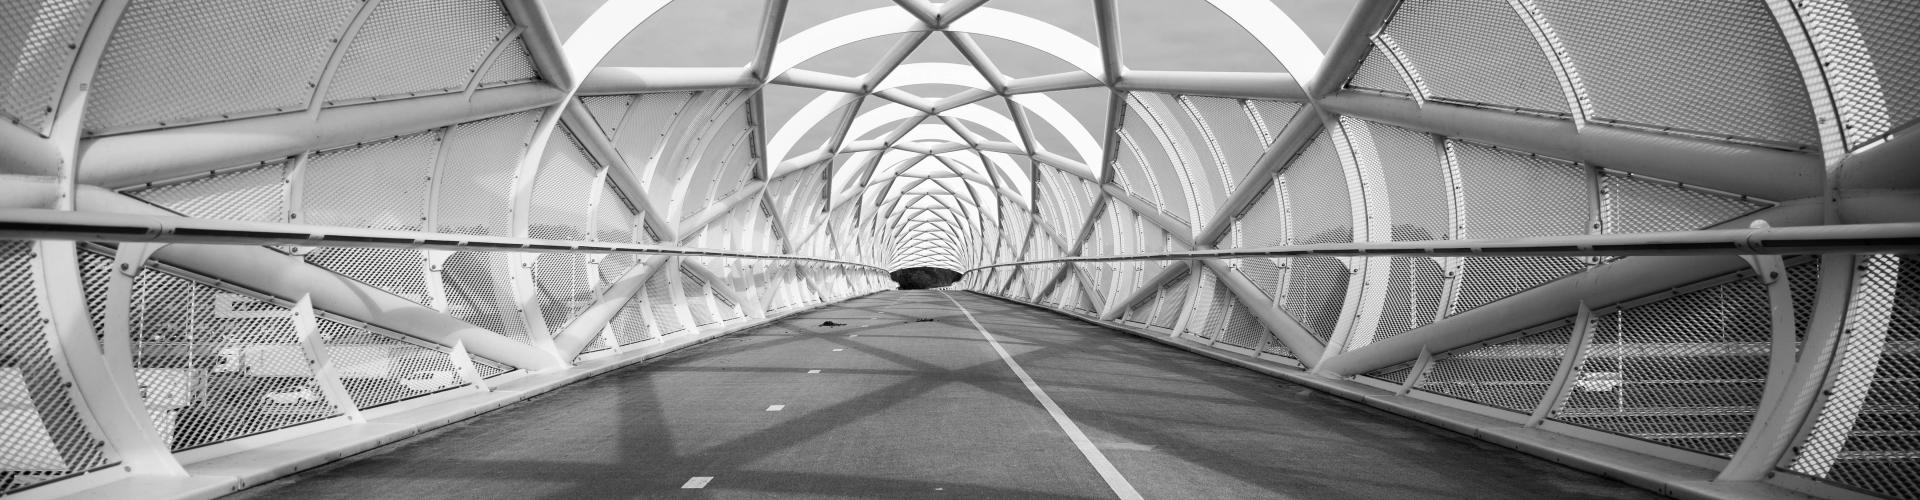 zwart wit brug Charlois rotterdam